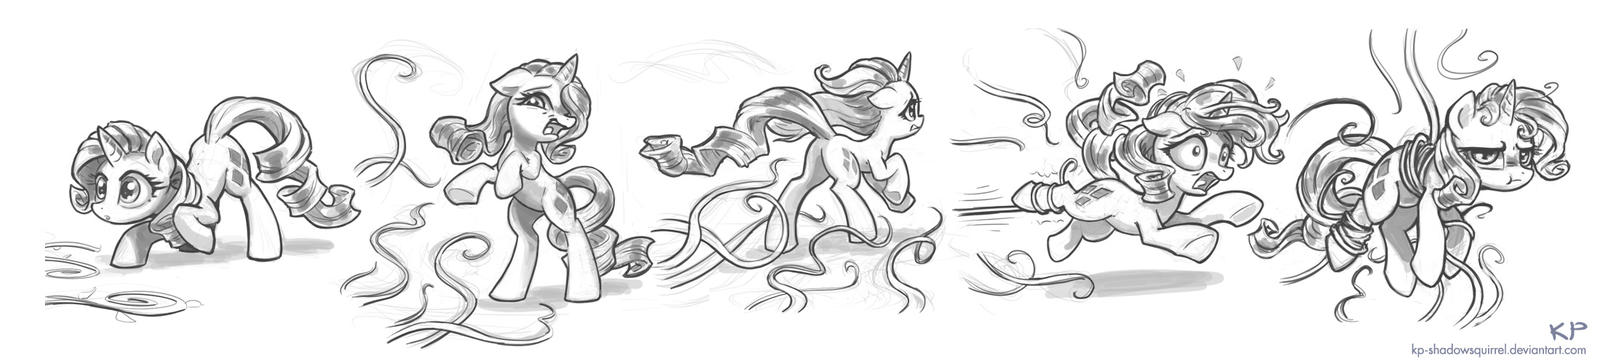 Rarity Sketches #6 by KP-ShadowSquirrel